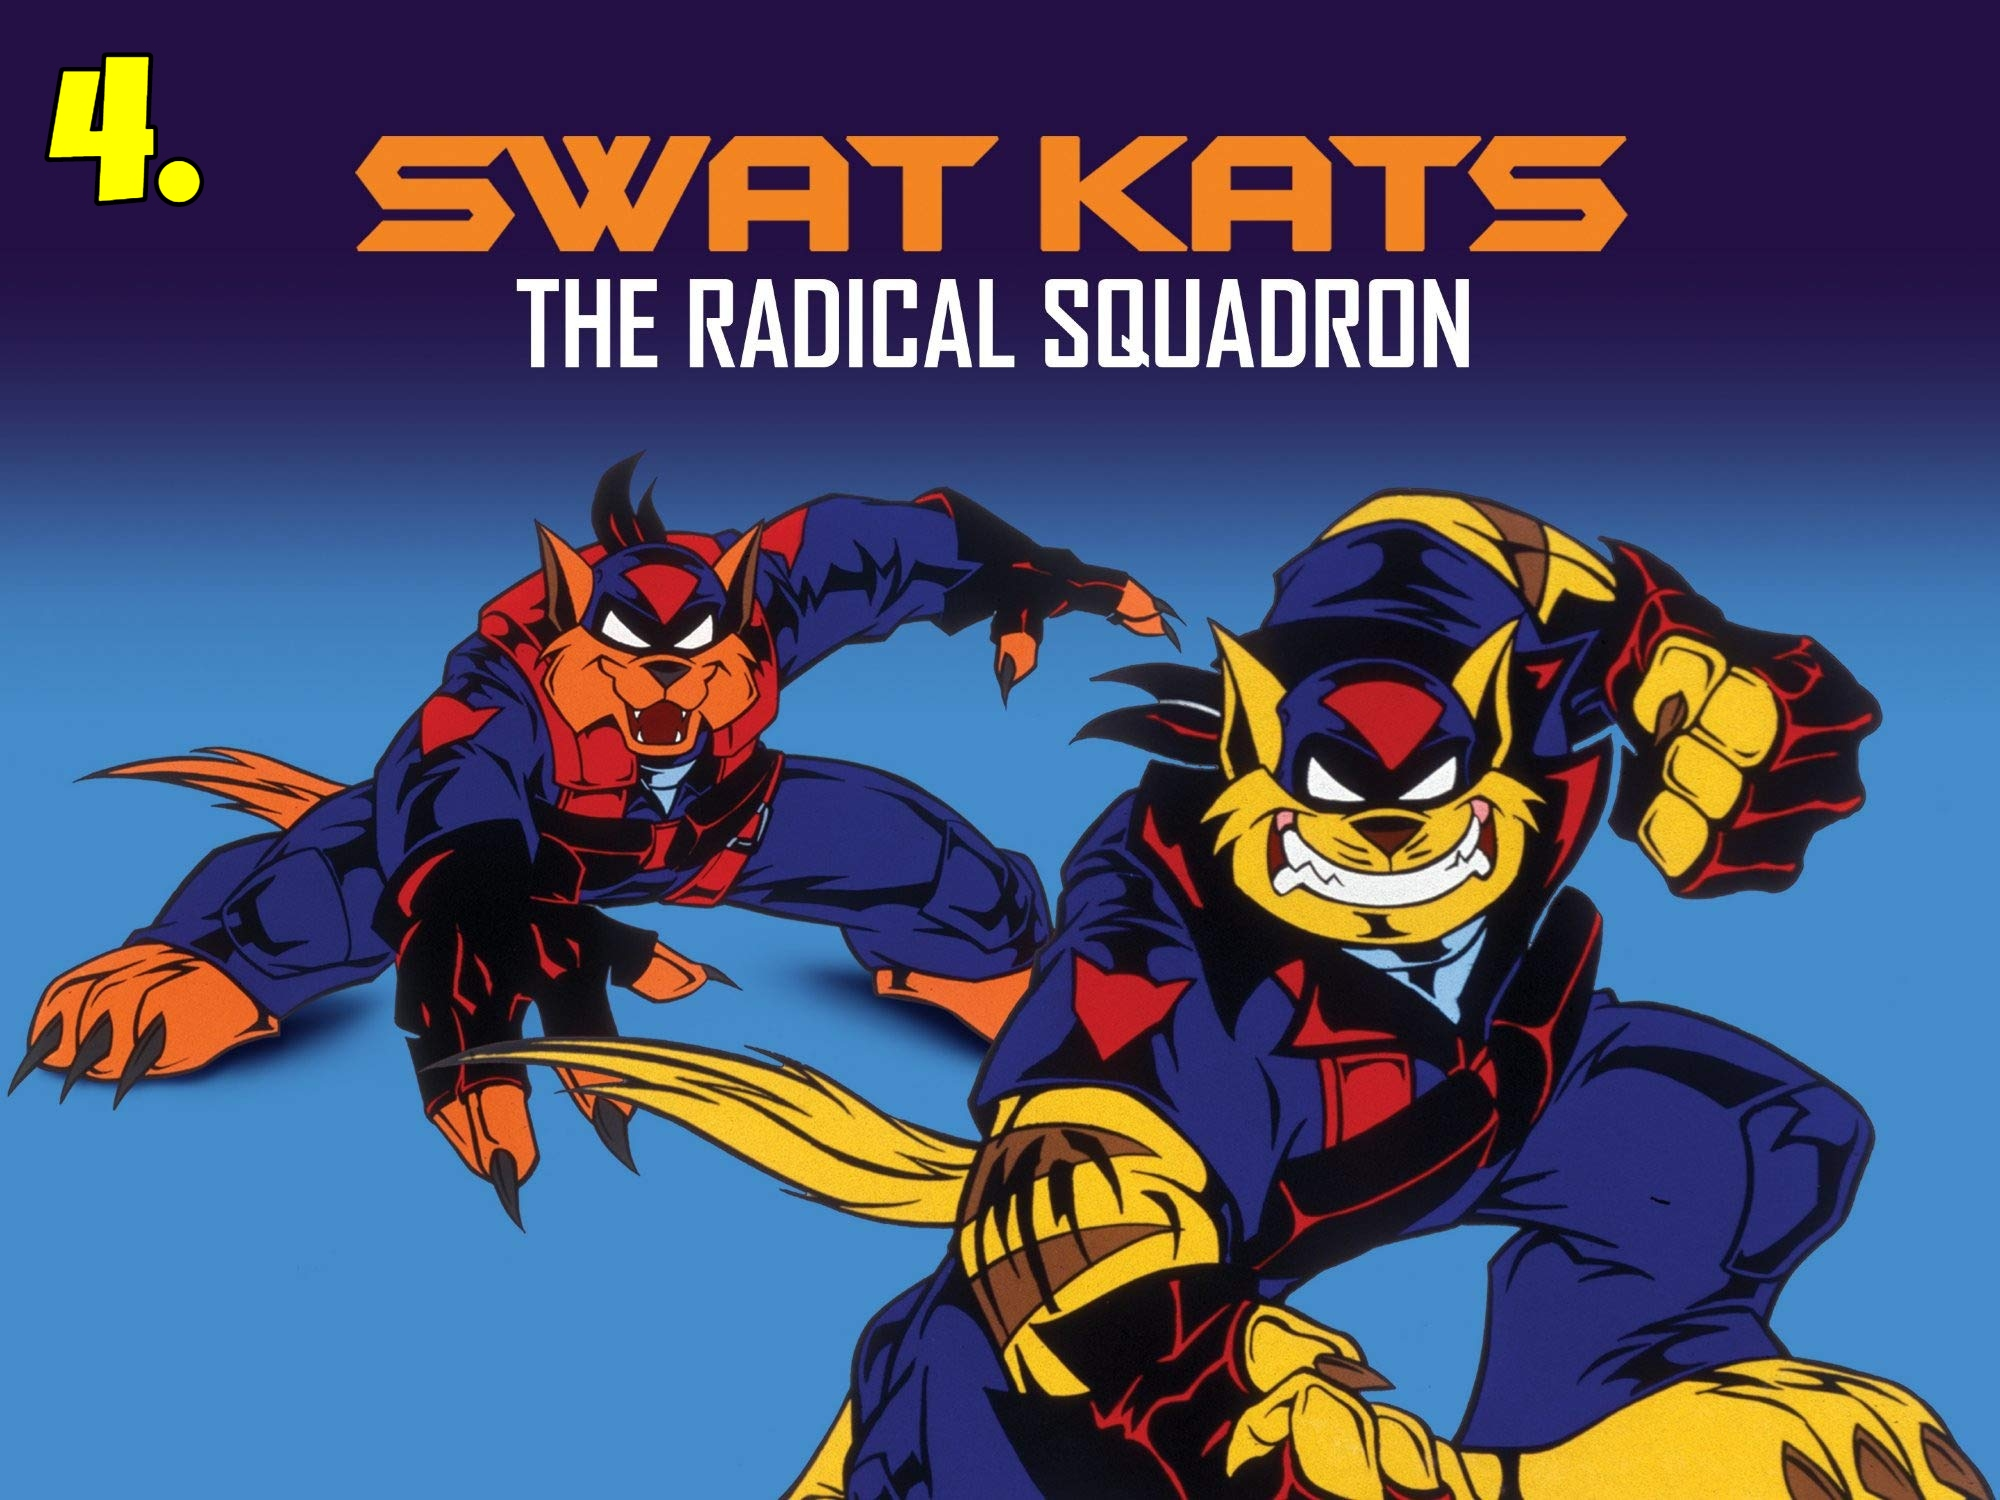 Swat Kats The Radical Squadron